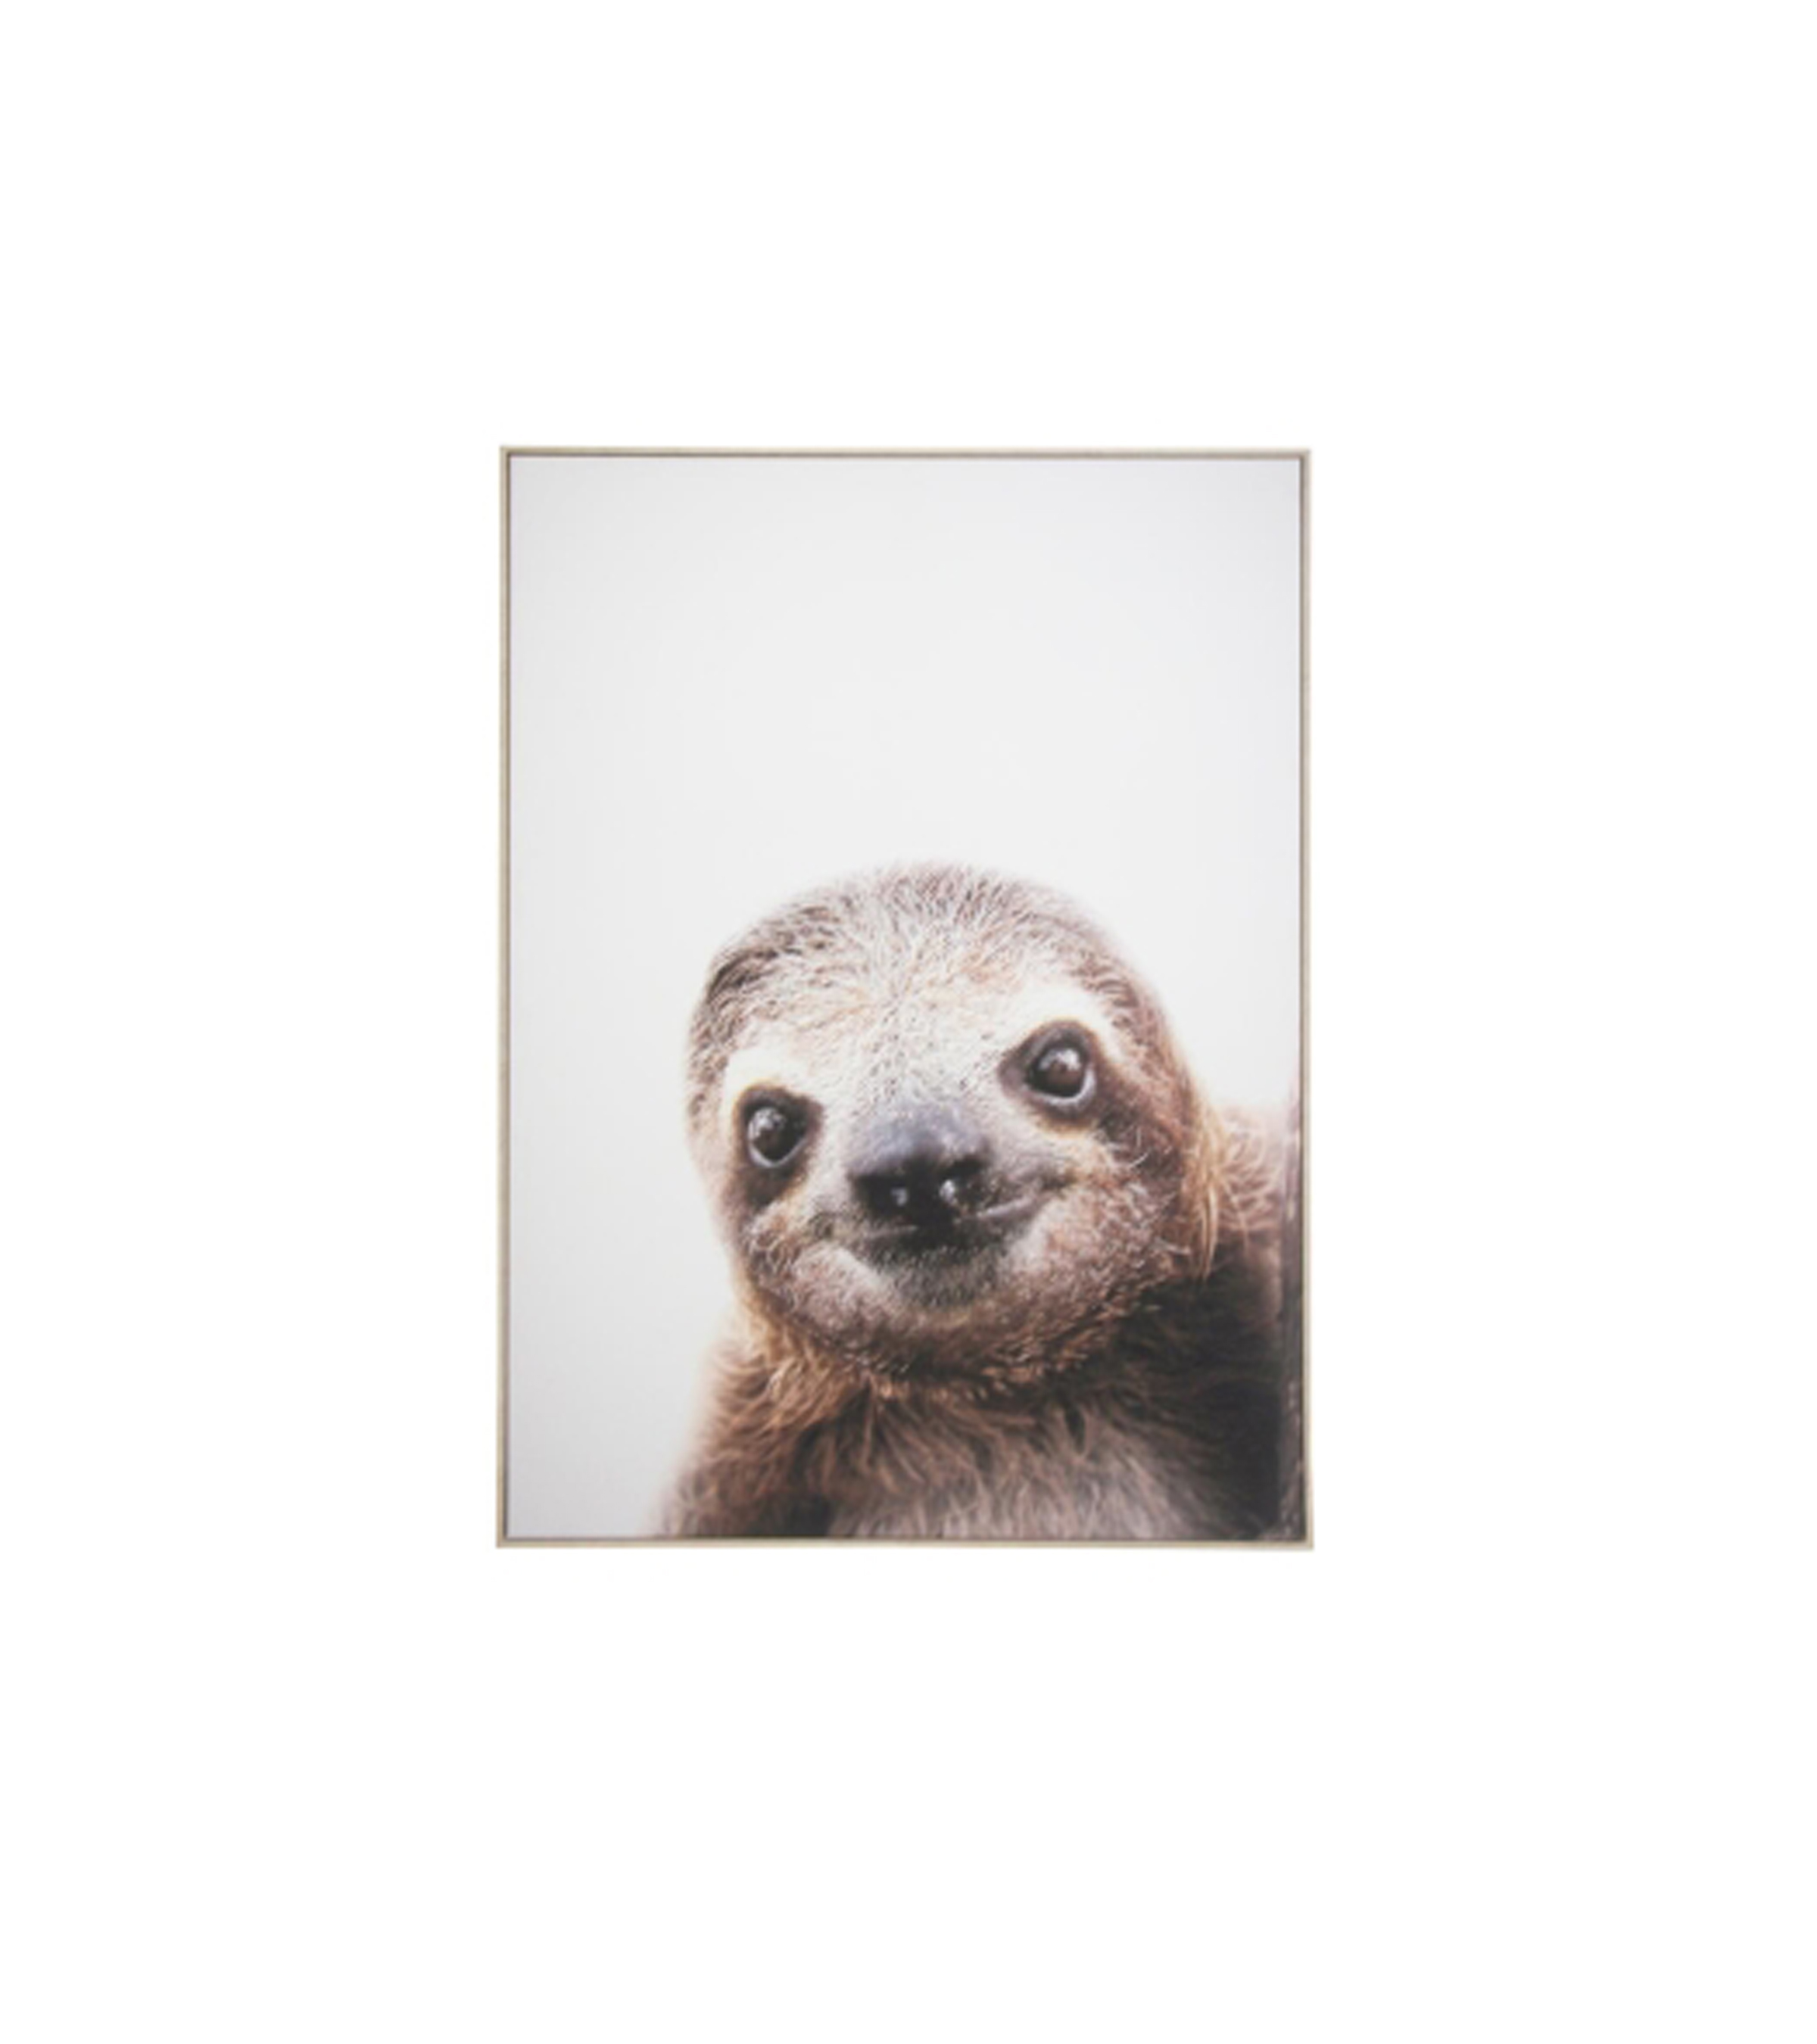 Stevie sloth